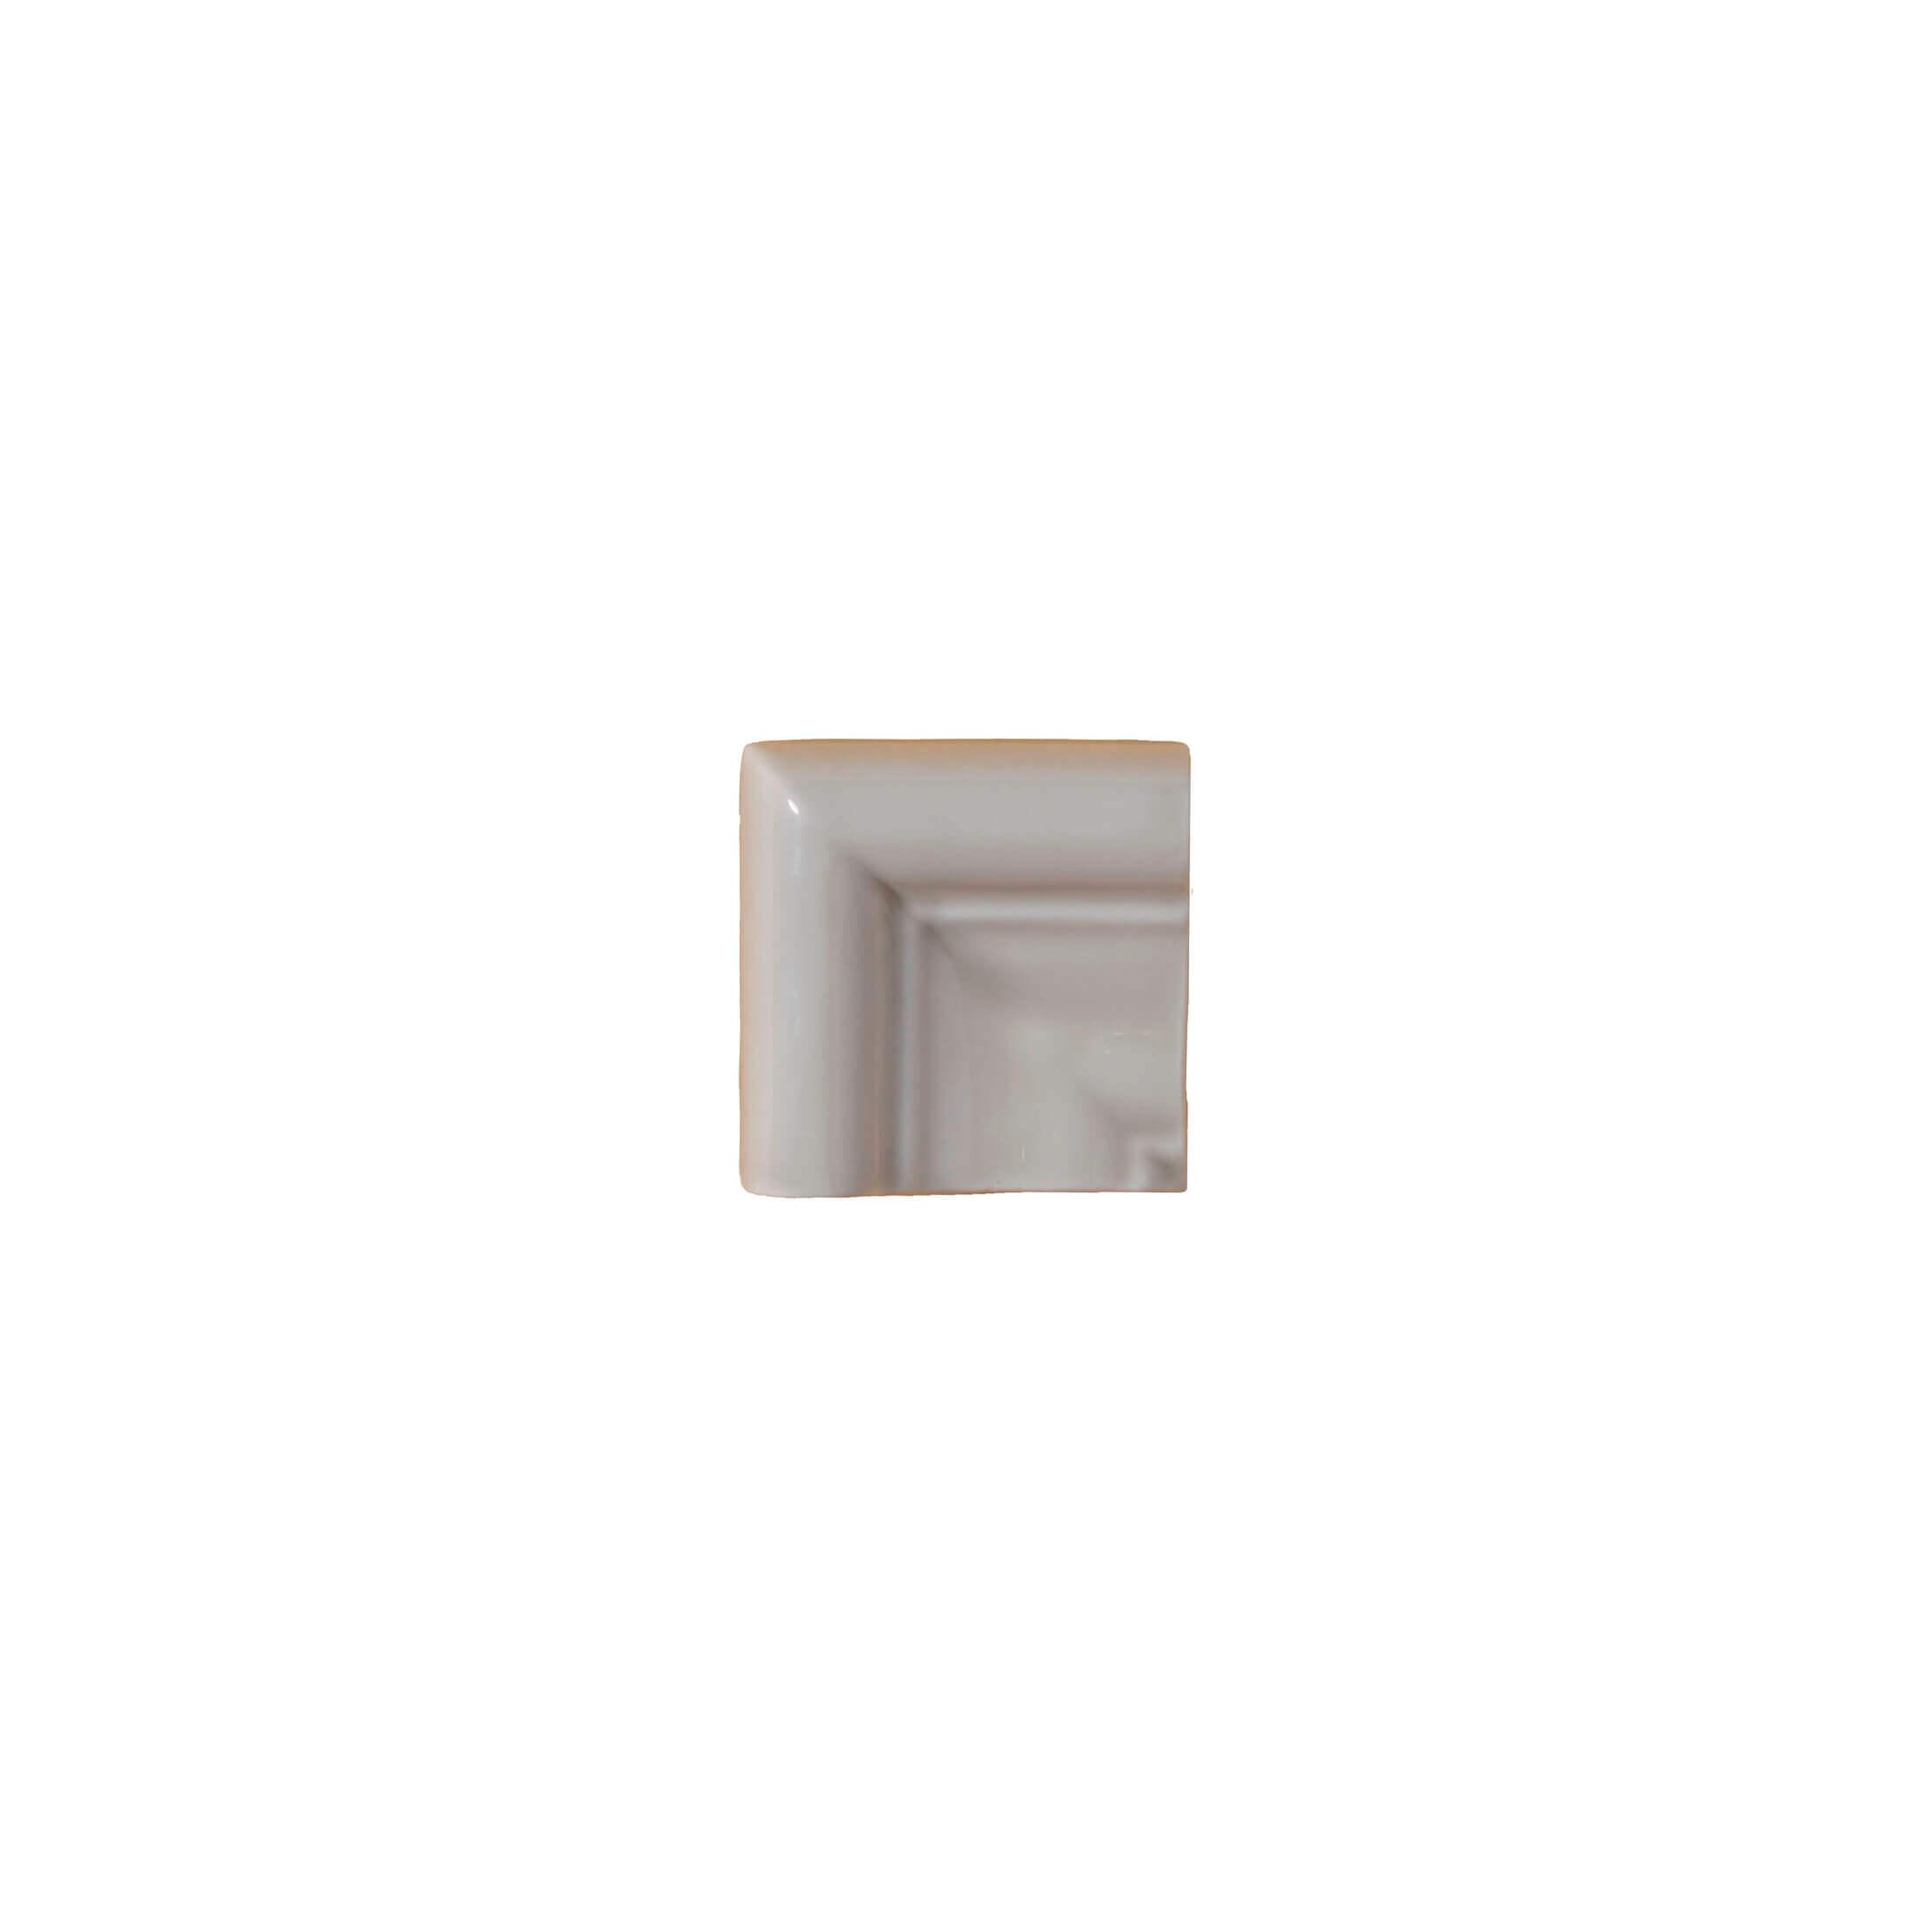 ADST5170 - ANGULO MARCO CORNISA - 7.5 cm X 19.8 cm